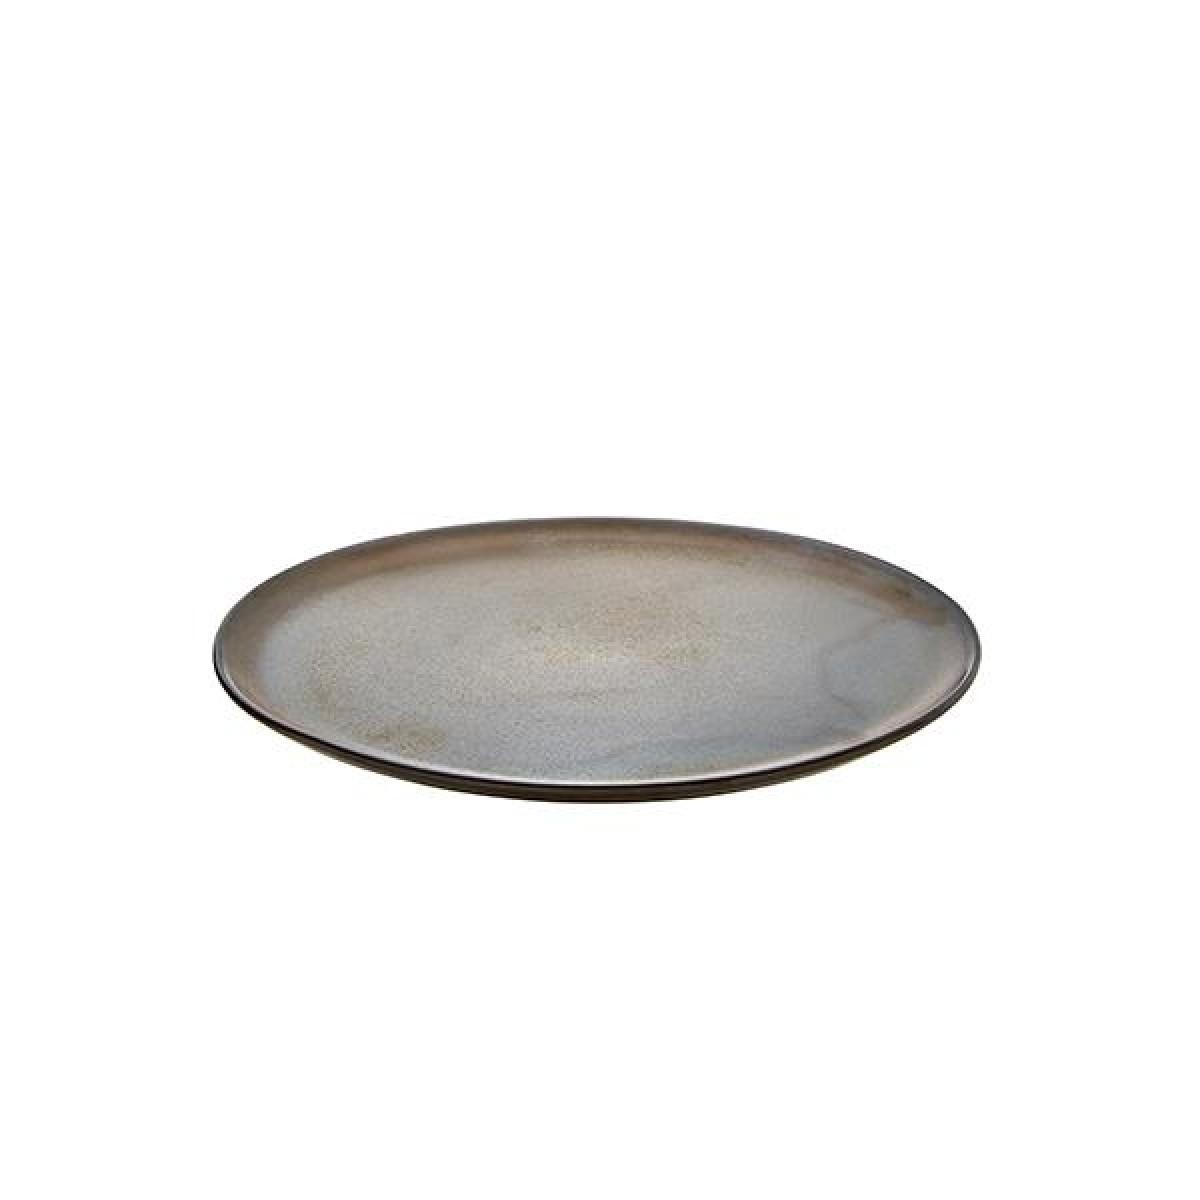 AIDA Raw middagstallerken 28 cm - metallic brown